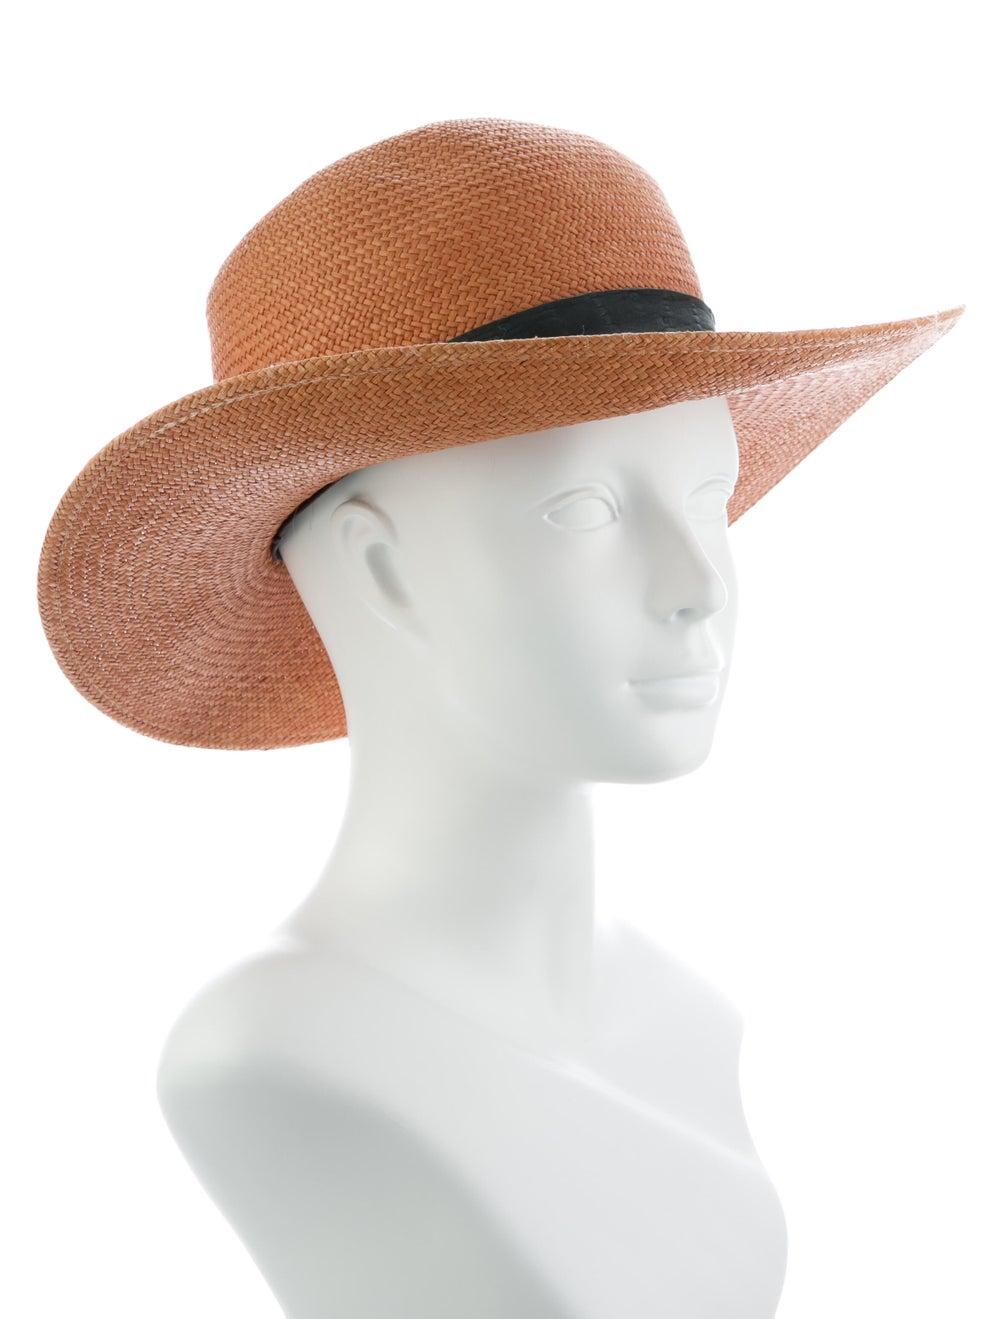 Janessa Leone Straw Wide Brim Hat Tan - image 3